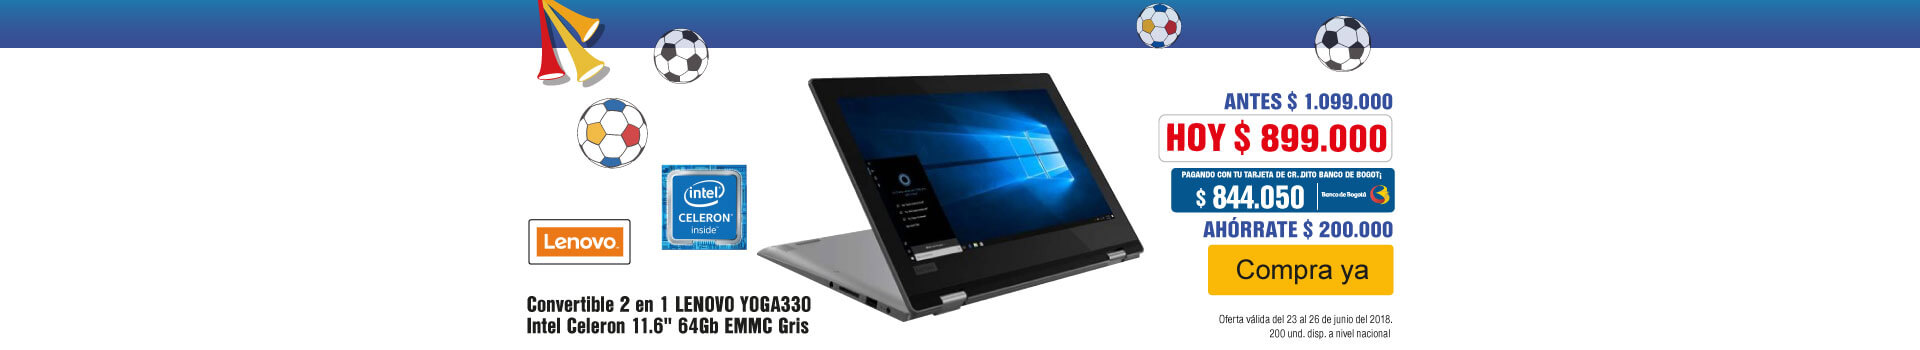 AK-KT-HIPER-1-computadores y tablets-PP---Lenovo-2en1 YOGA330-Jun23